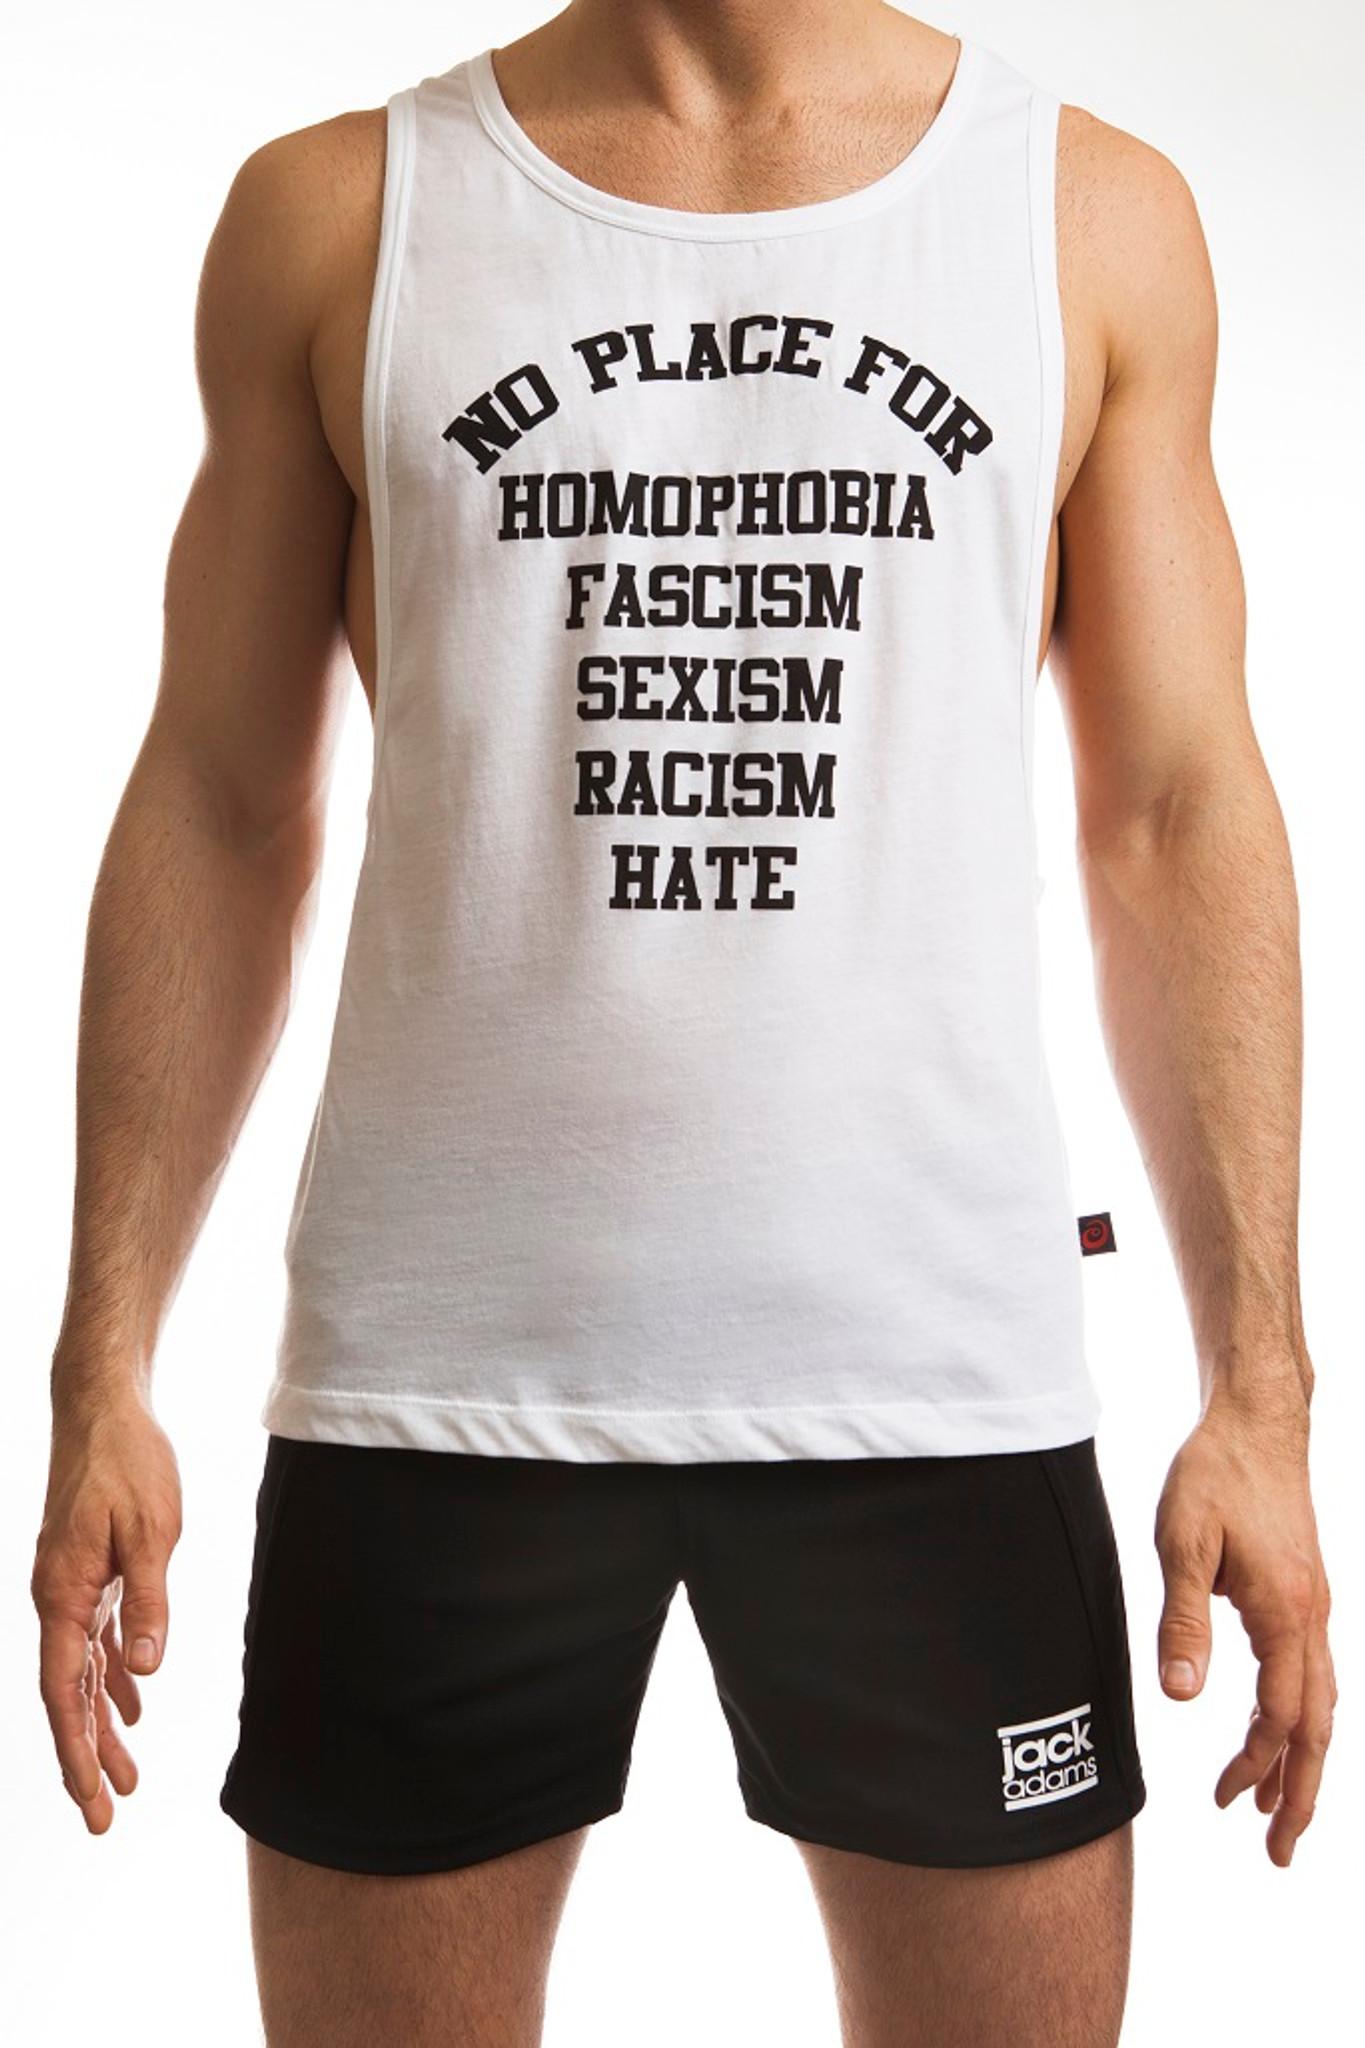 Jack Adams Equality Tank Top